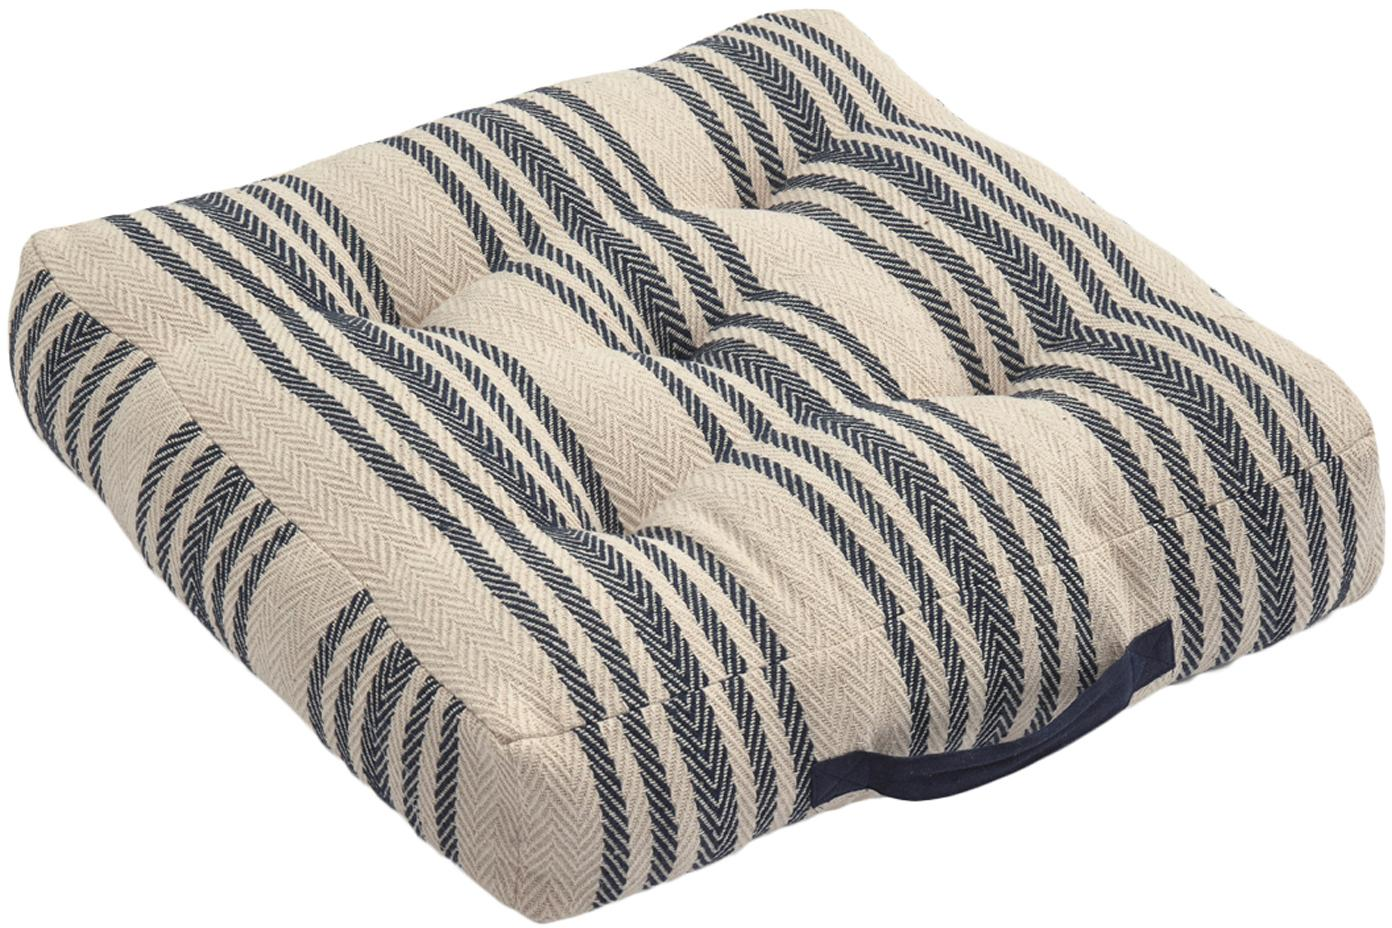 Gestreept vloerkussen Puket, Donkerblauw, wit, B 60 cm